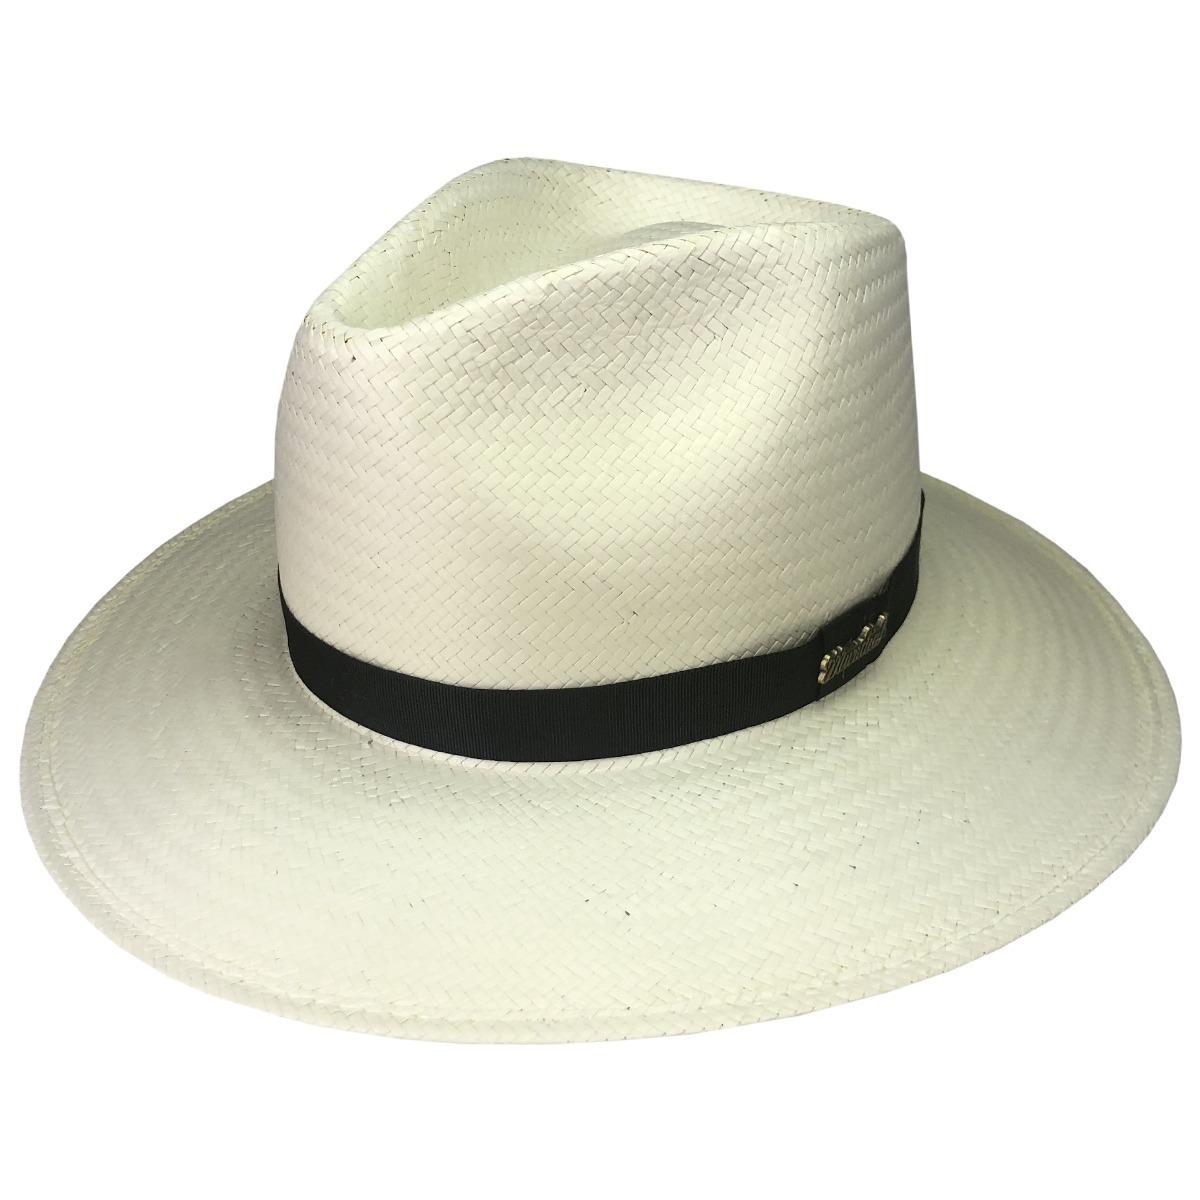 Chapéu Social Panamá Importado Moda Casual Promoção - R  145 8b2fc7654f3